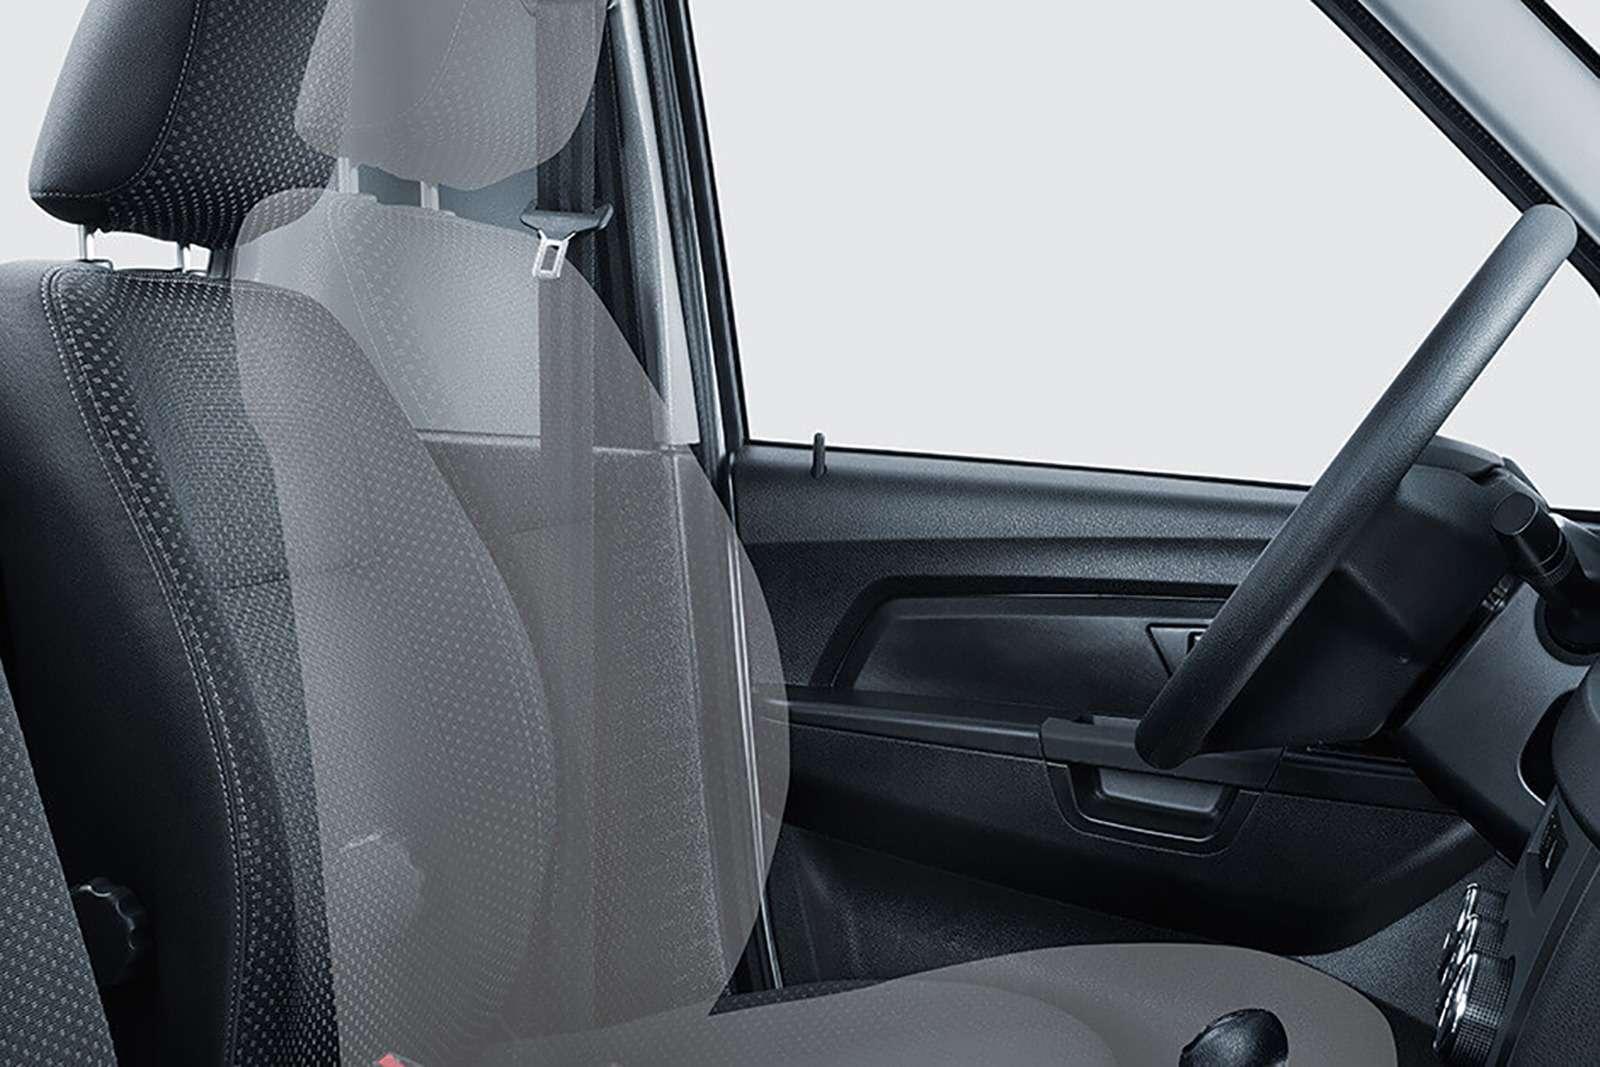 УАЗначал продажи конкурента ГАЗели Бизнес— фото 805870